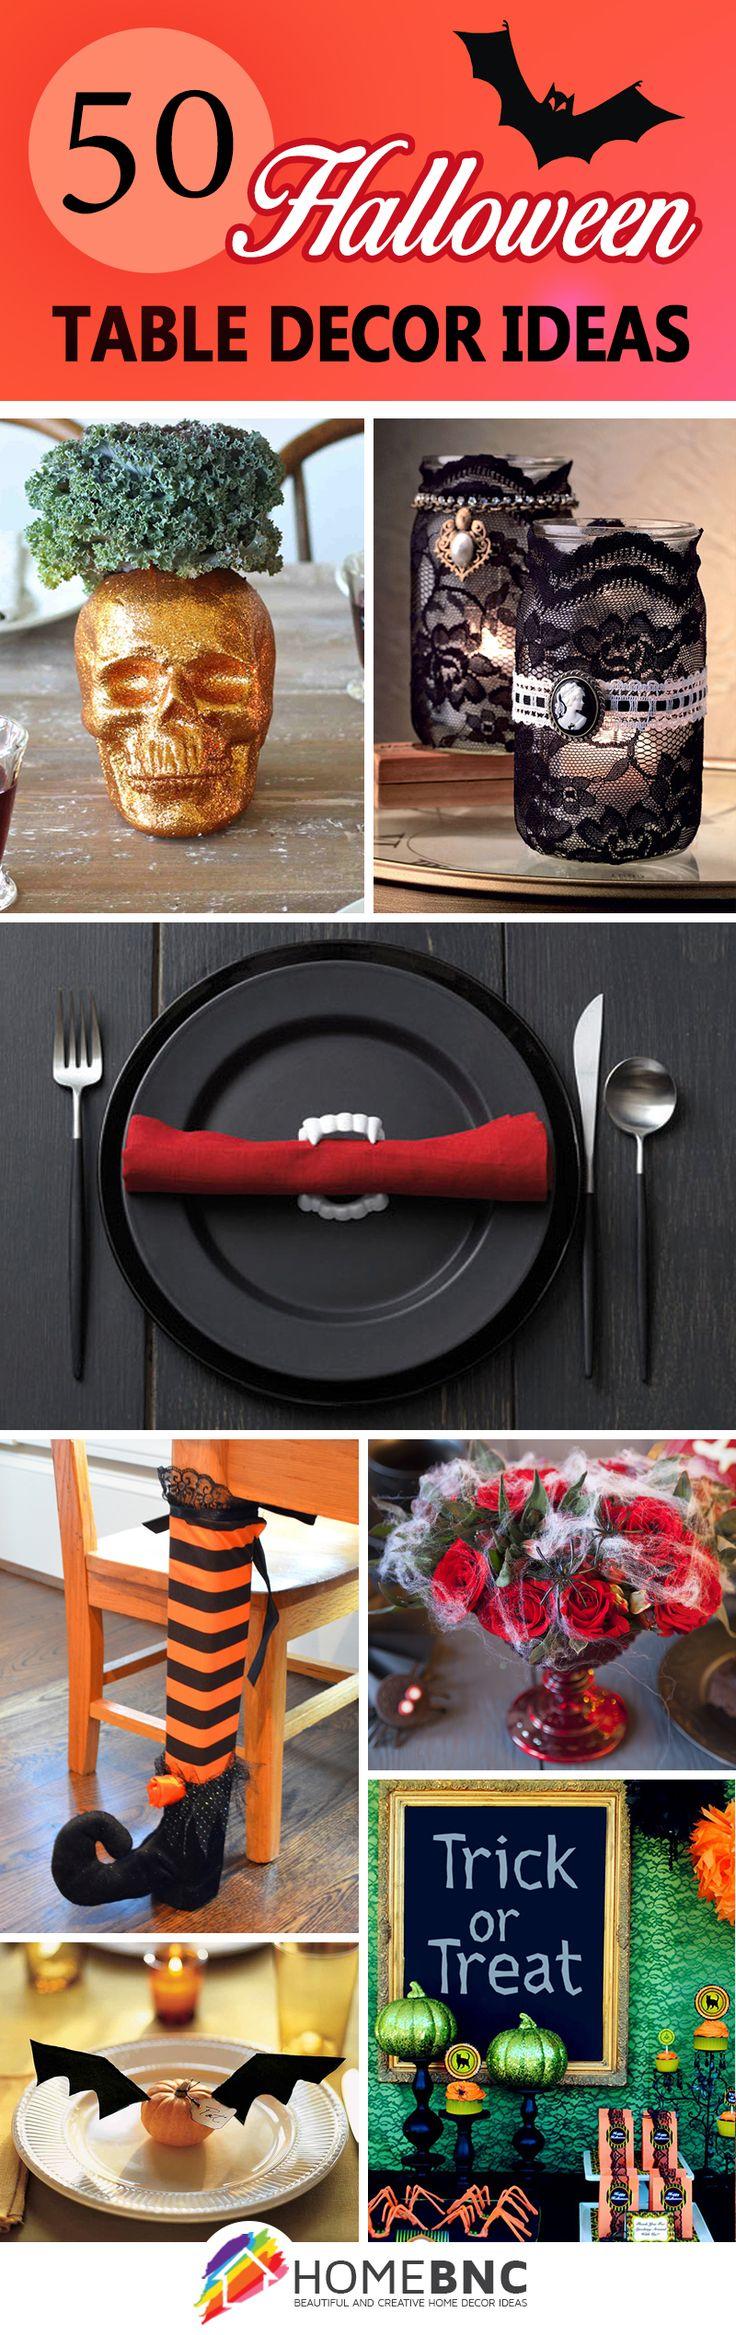 Best 25+ Halloween table decorations ideas on Pinterest ...